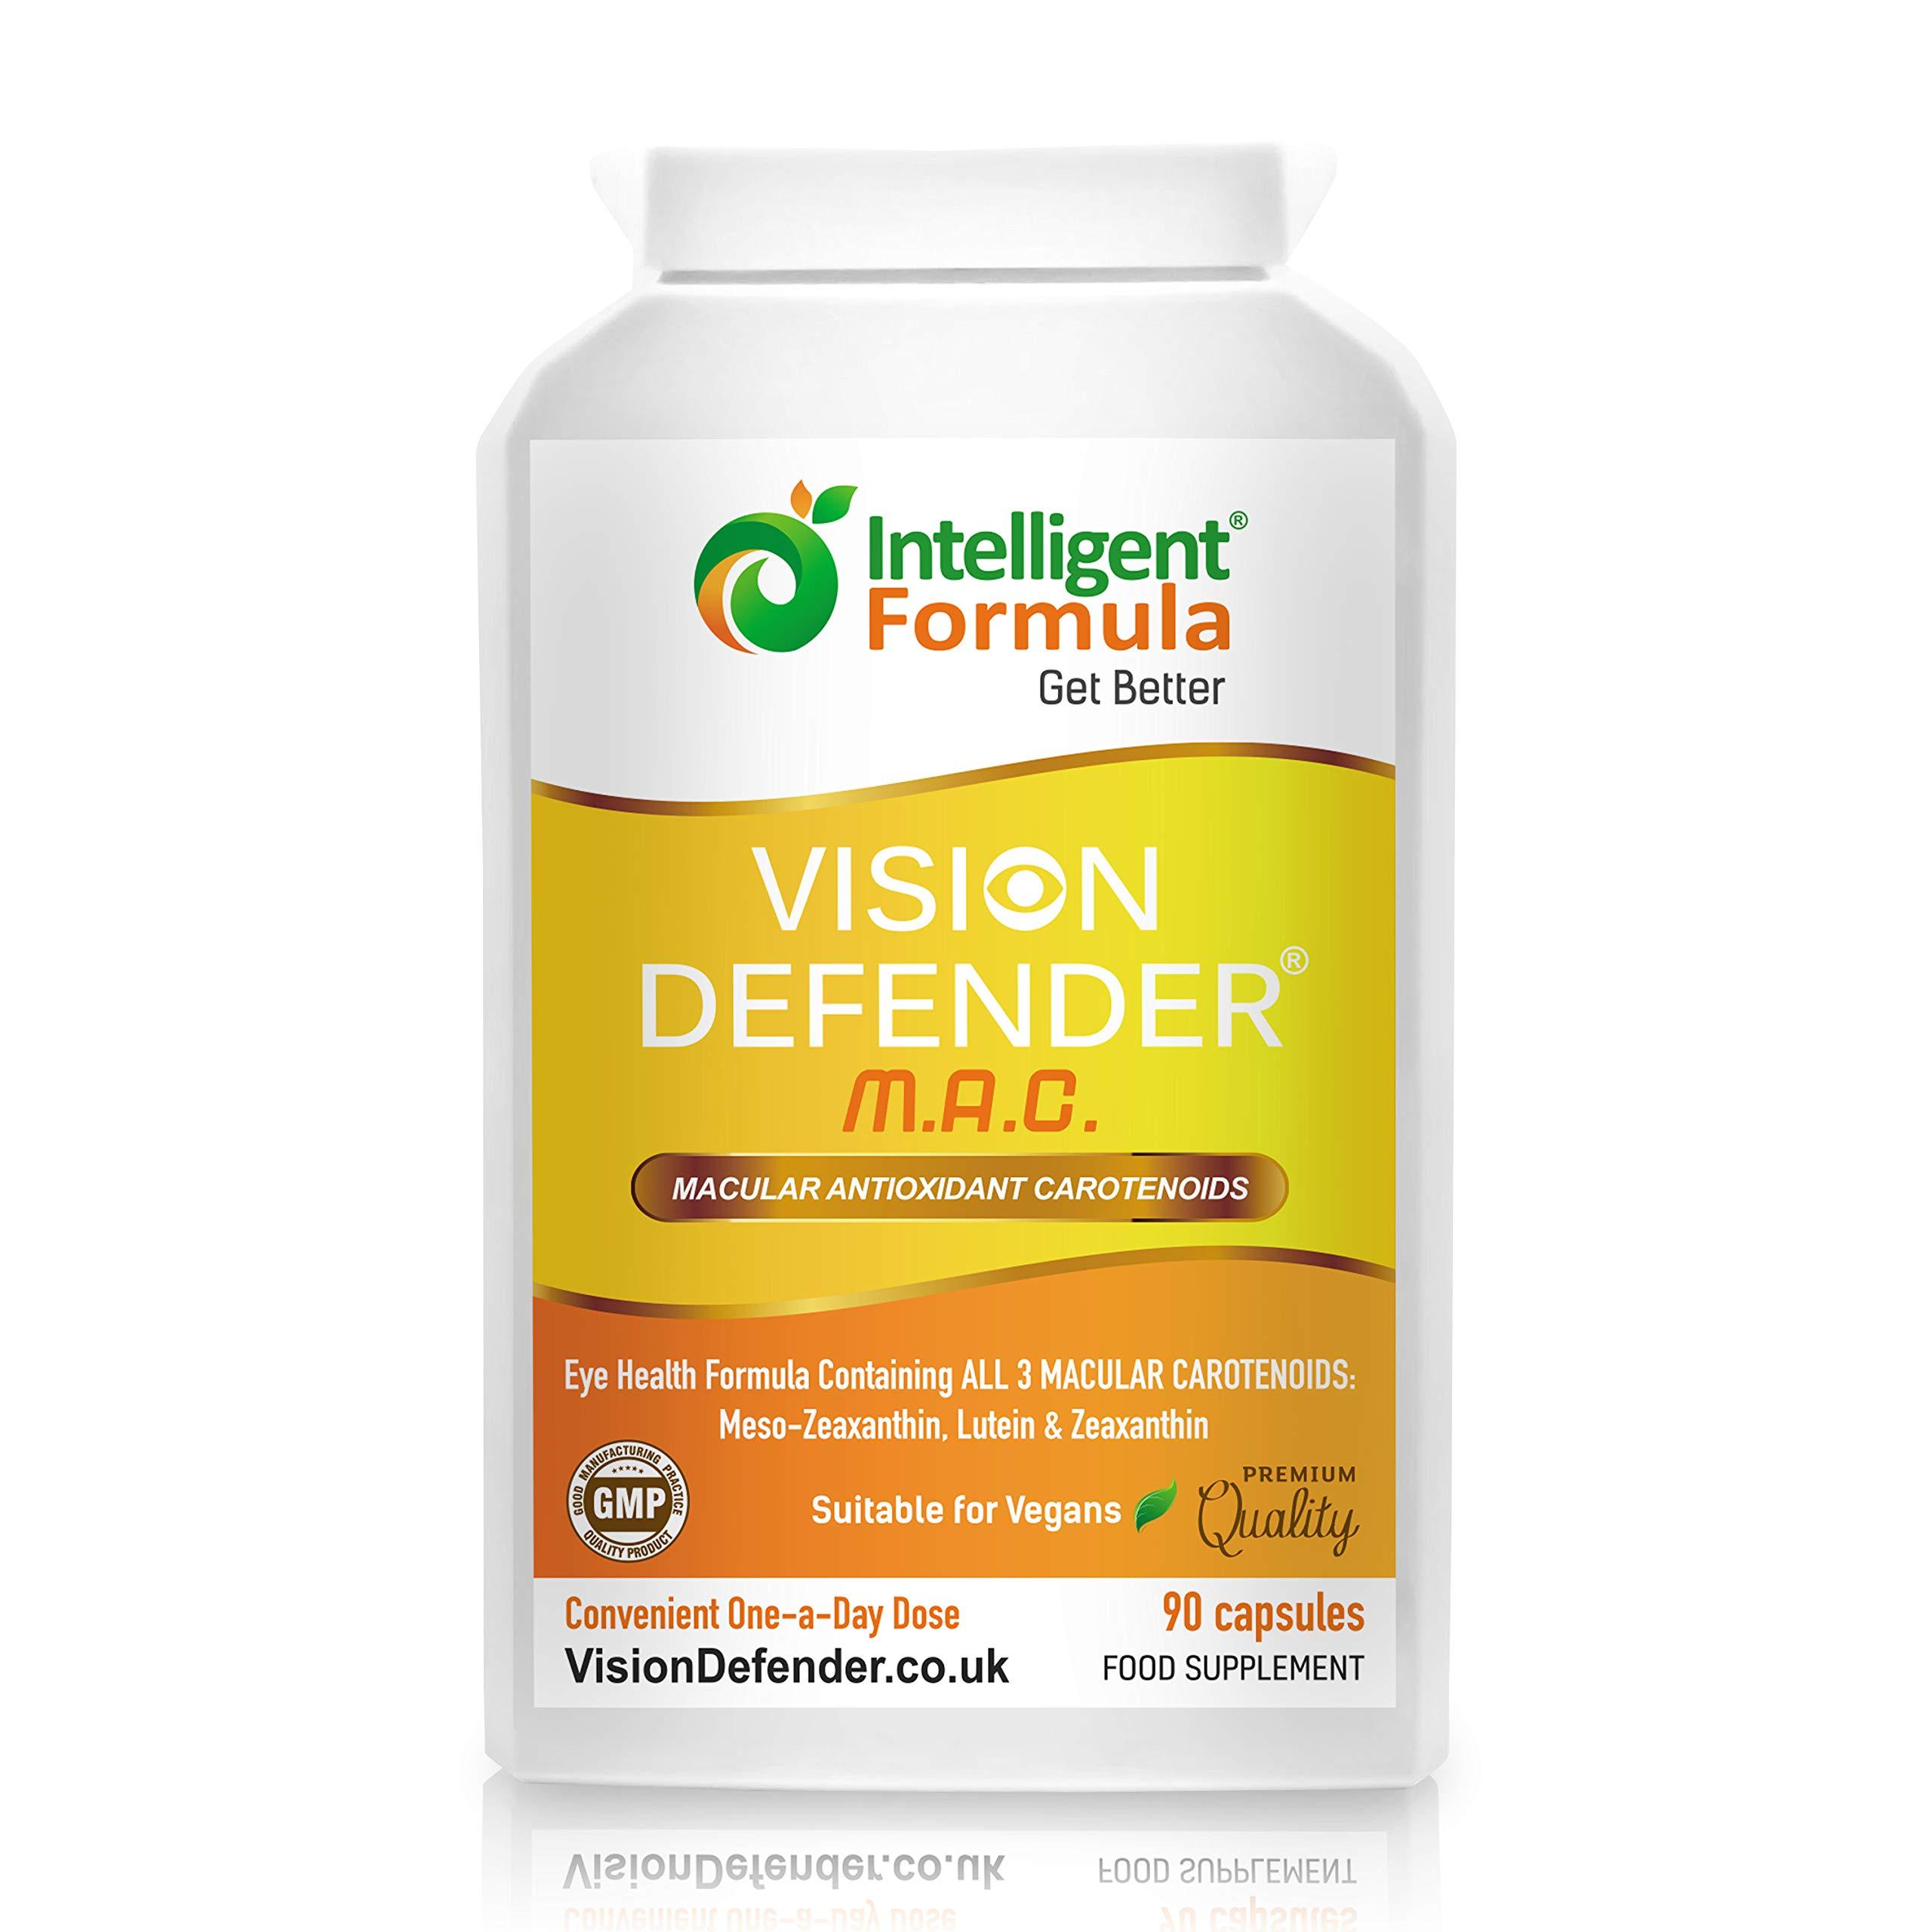 Lutein, Zeaxanthin & Meso-Zeaxanthin Eye Supplement: VISION DEFENDER MAC-Shield Your Eyes, Save Your Eyesight, Vegan/Vegetarian Antioxidant Carotenoids for Eyes (90 Capsules/One-A-Day) Made in UK